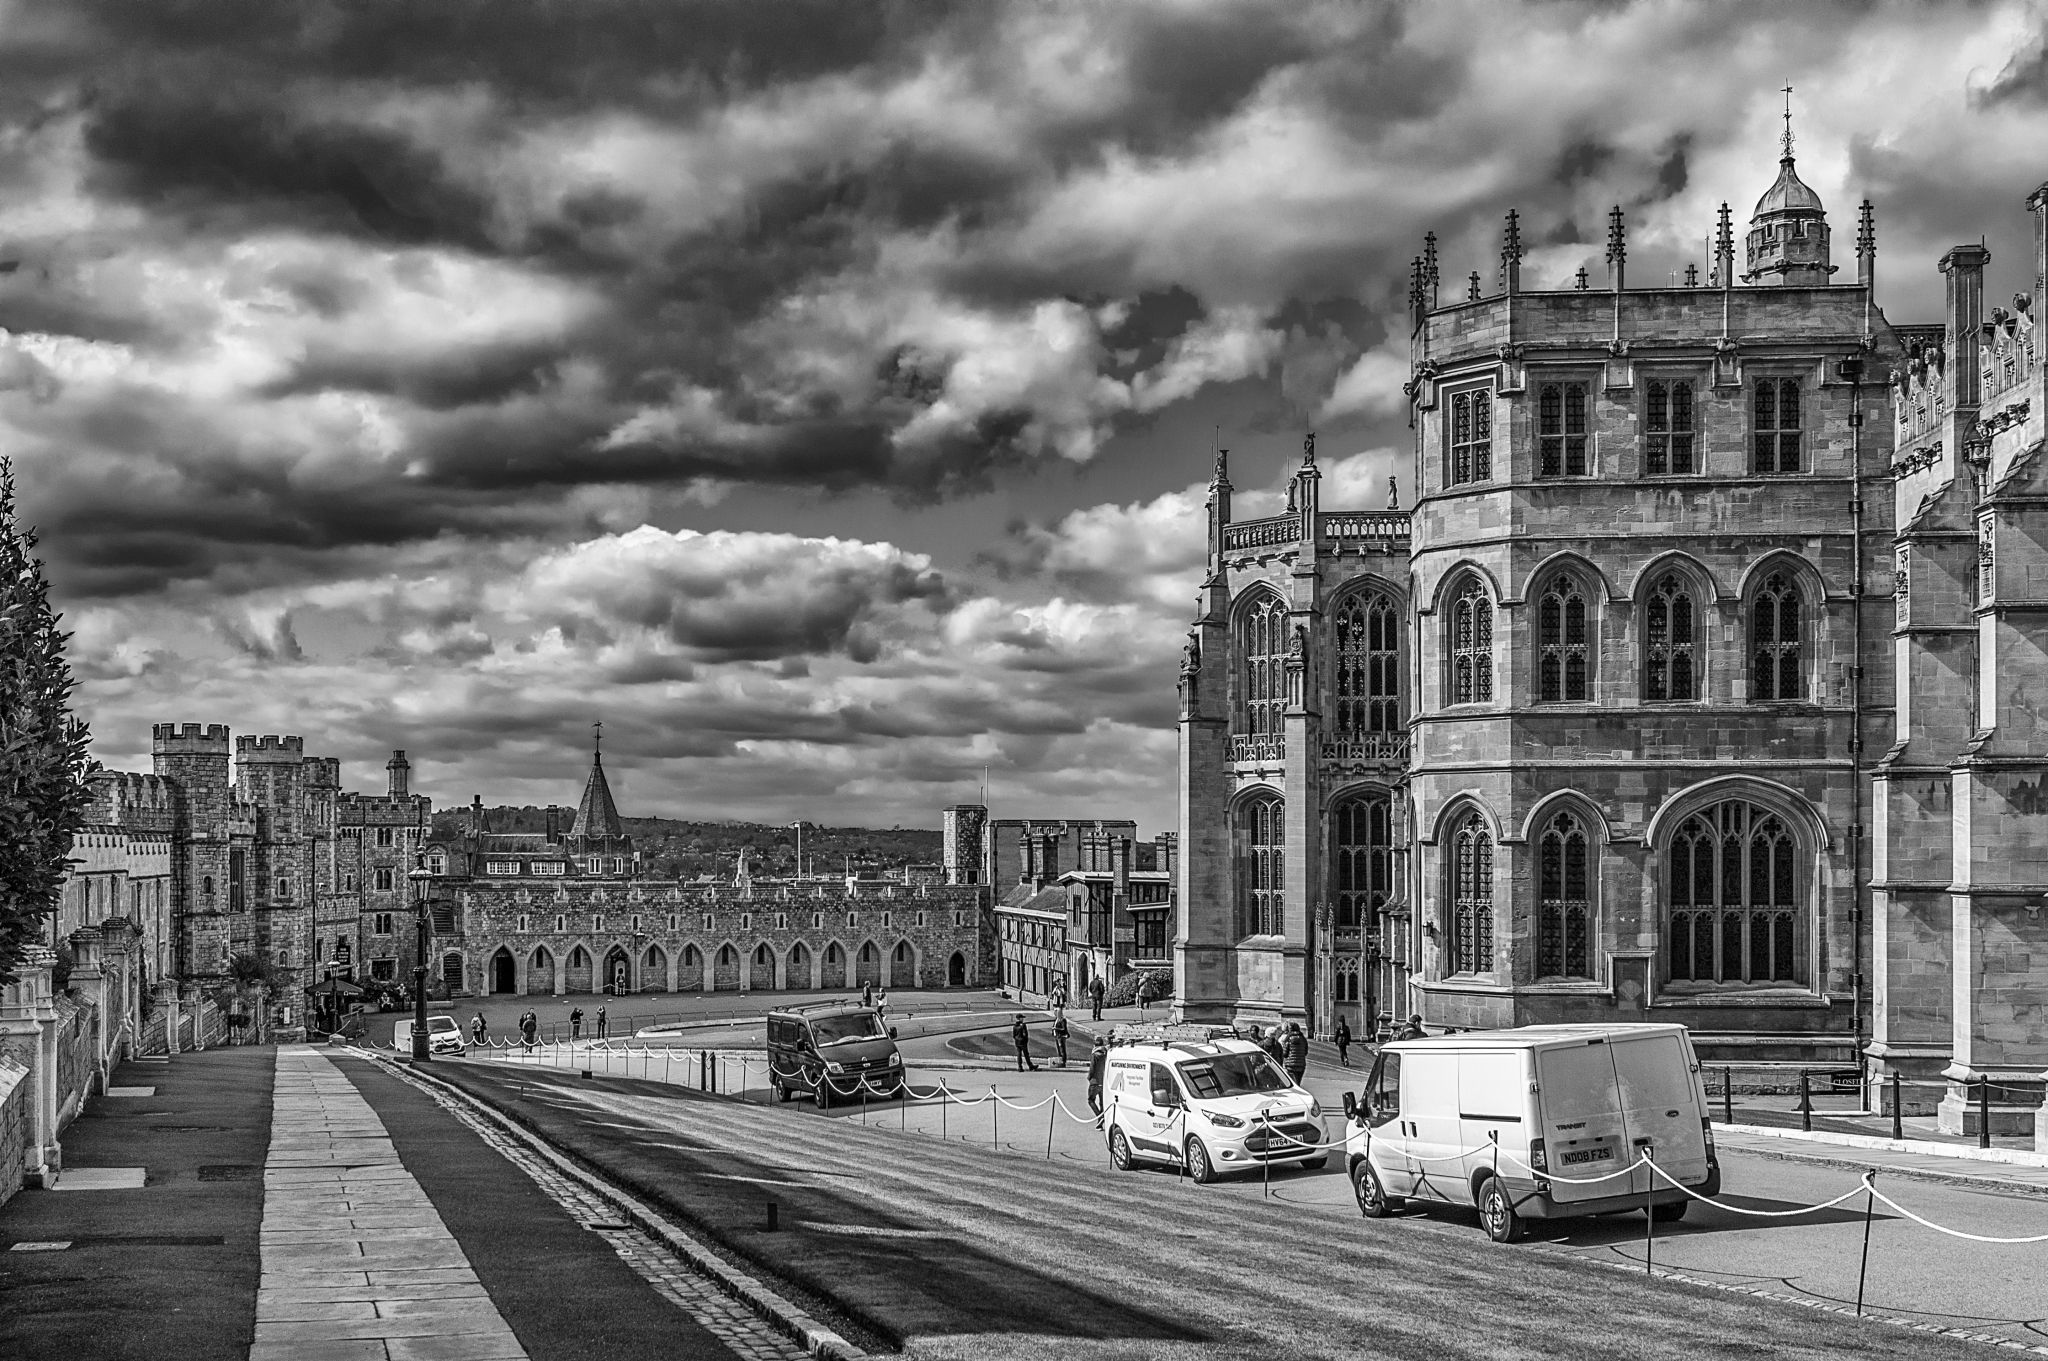 St George's Chapel, Windsor Castle, United Kingdom